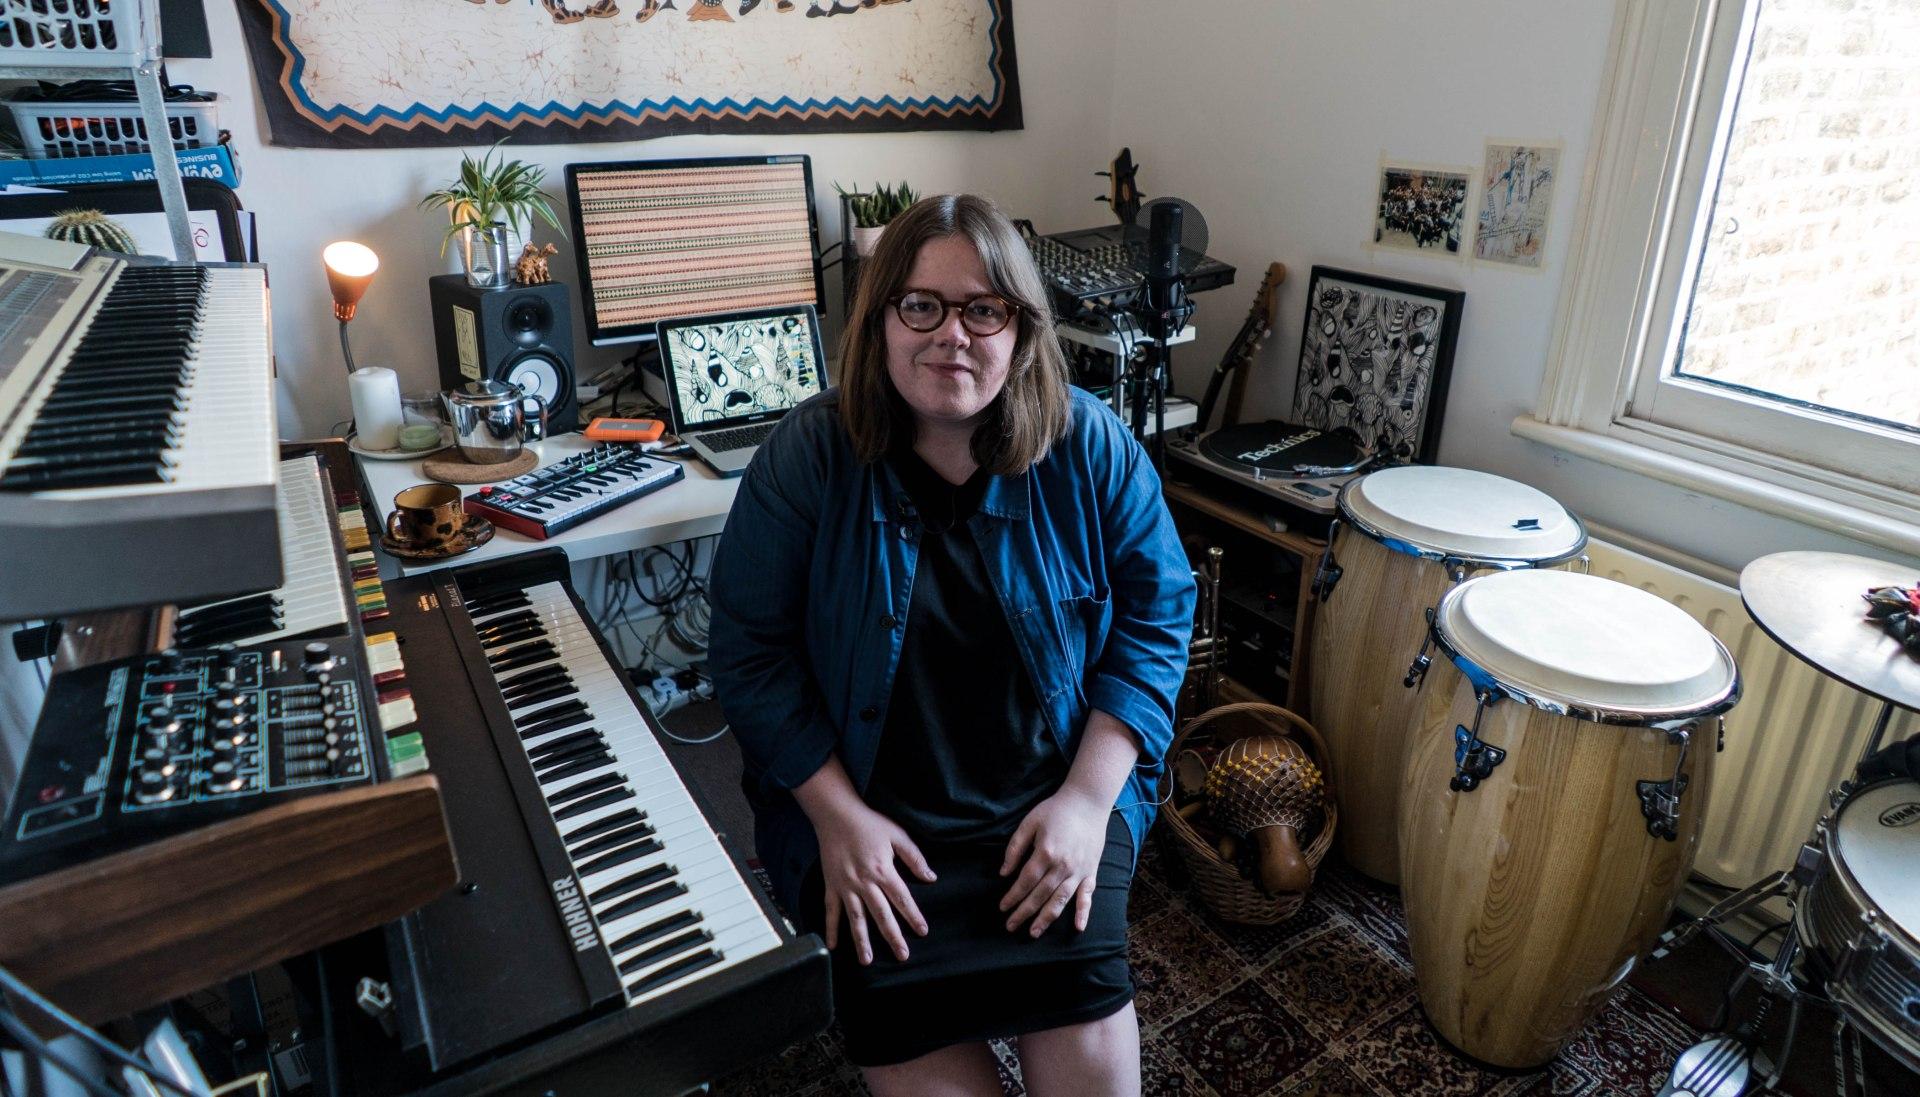 Emma-Jean Thackray shares new music.